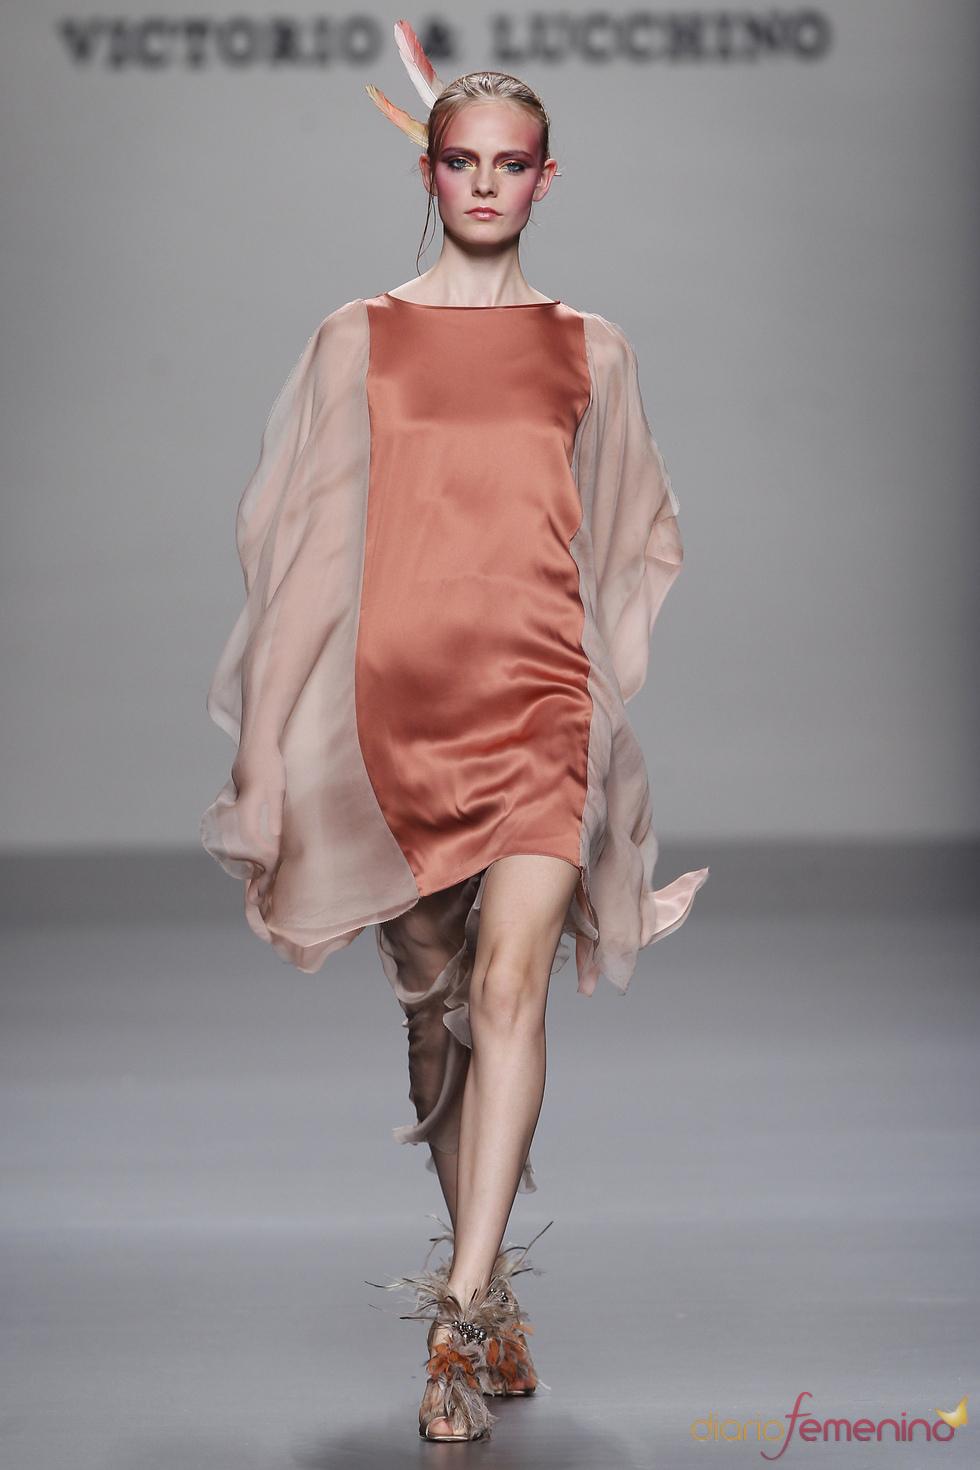 Victorio & Lucchino en Cibeles Madrid Fashion Week